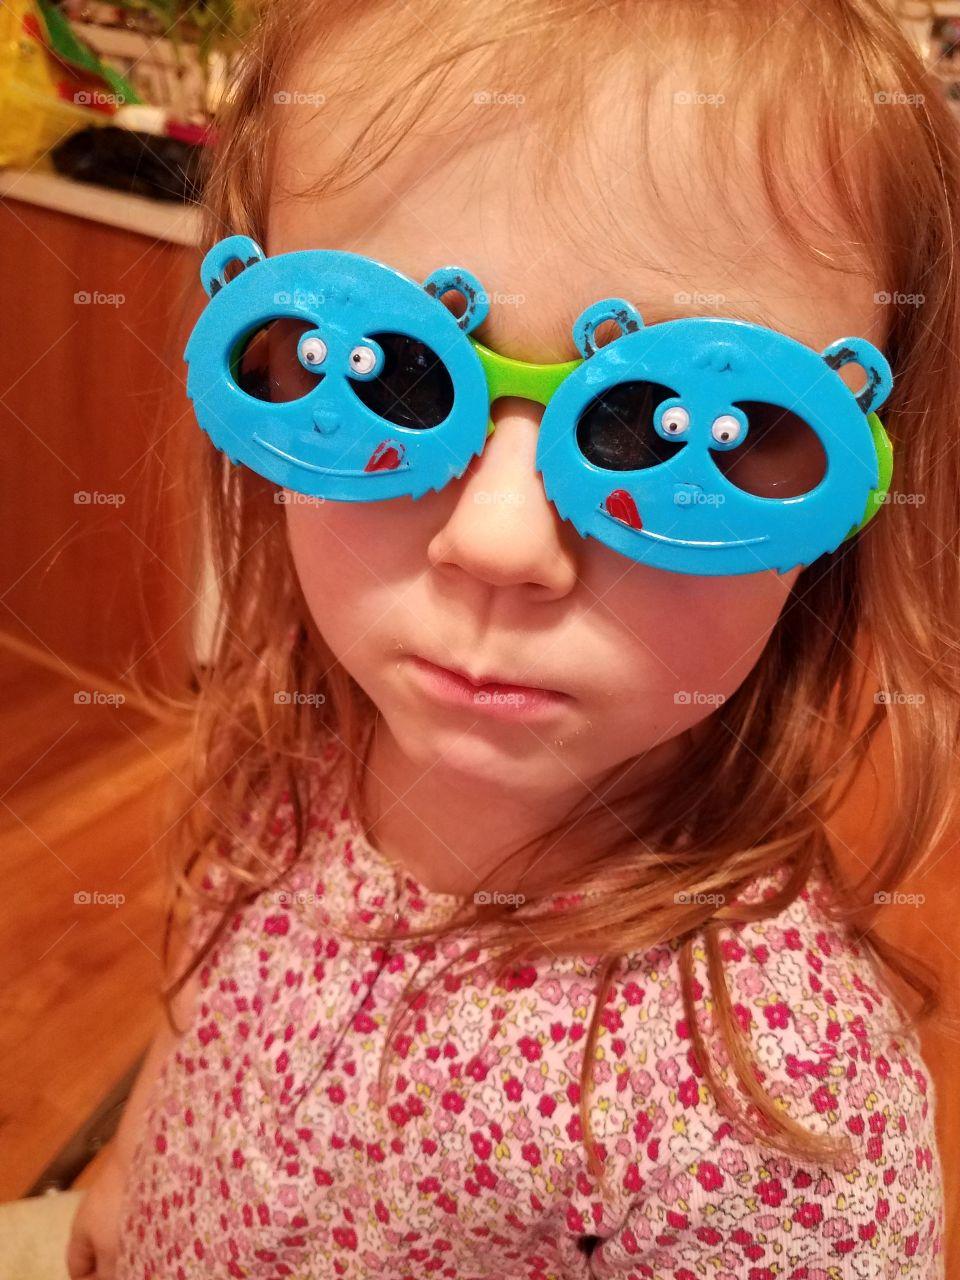 Portrait of girl wearing eyeglasses